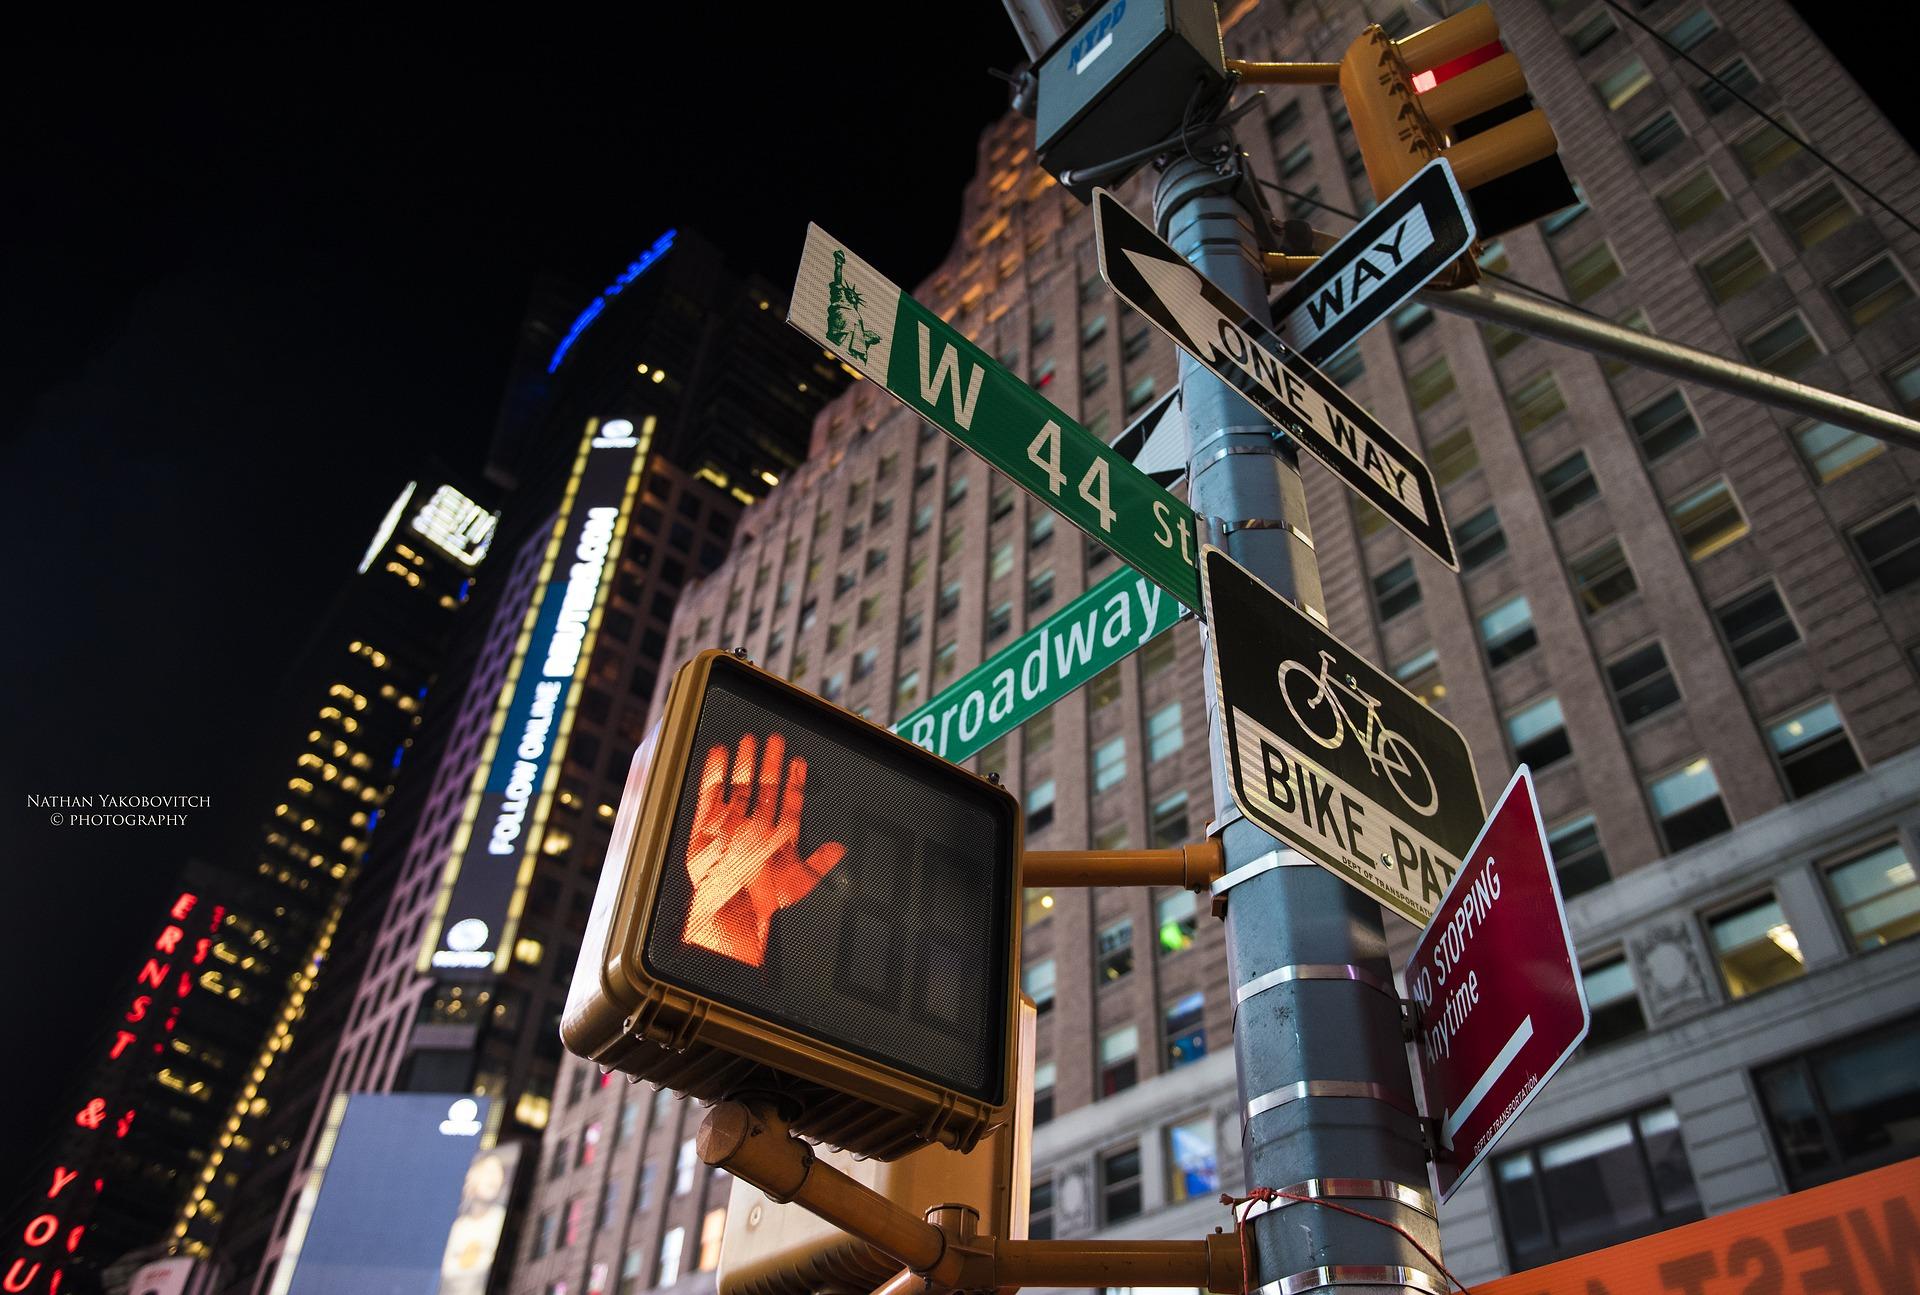 Städtereise günstig ab 446,55€ - Central Park New York City Manhattan 1